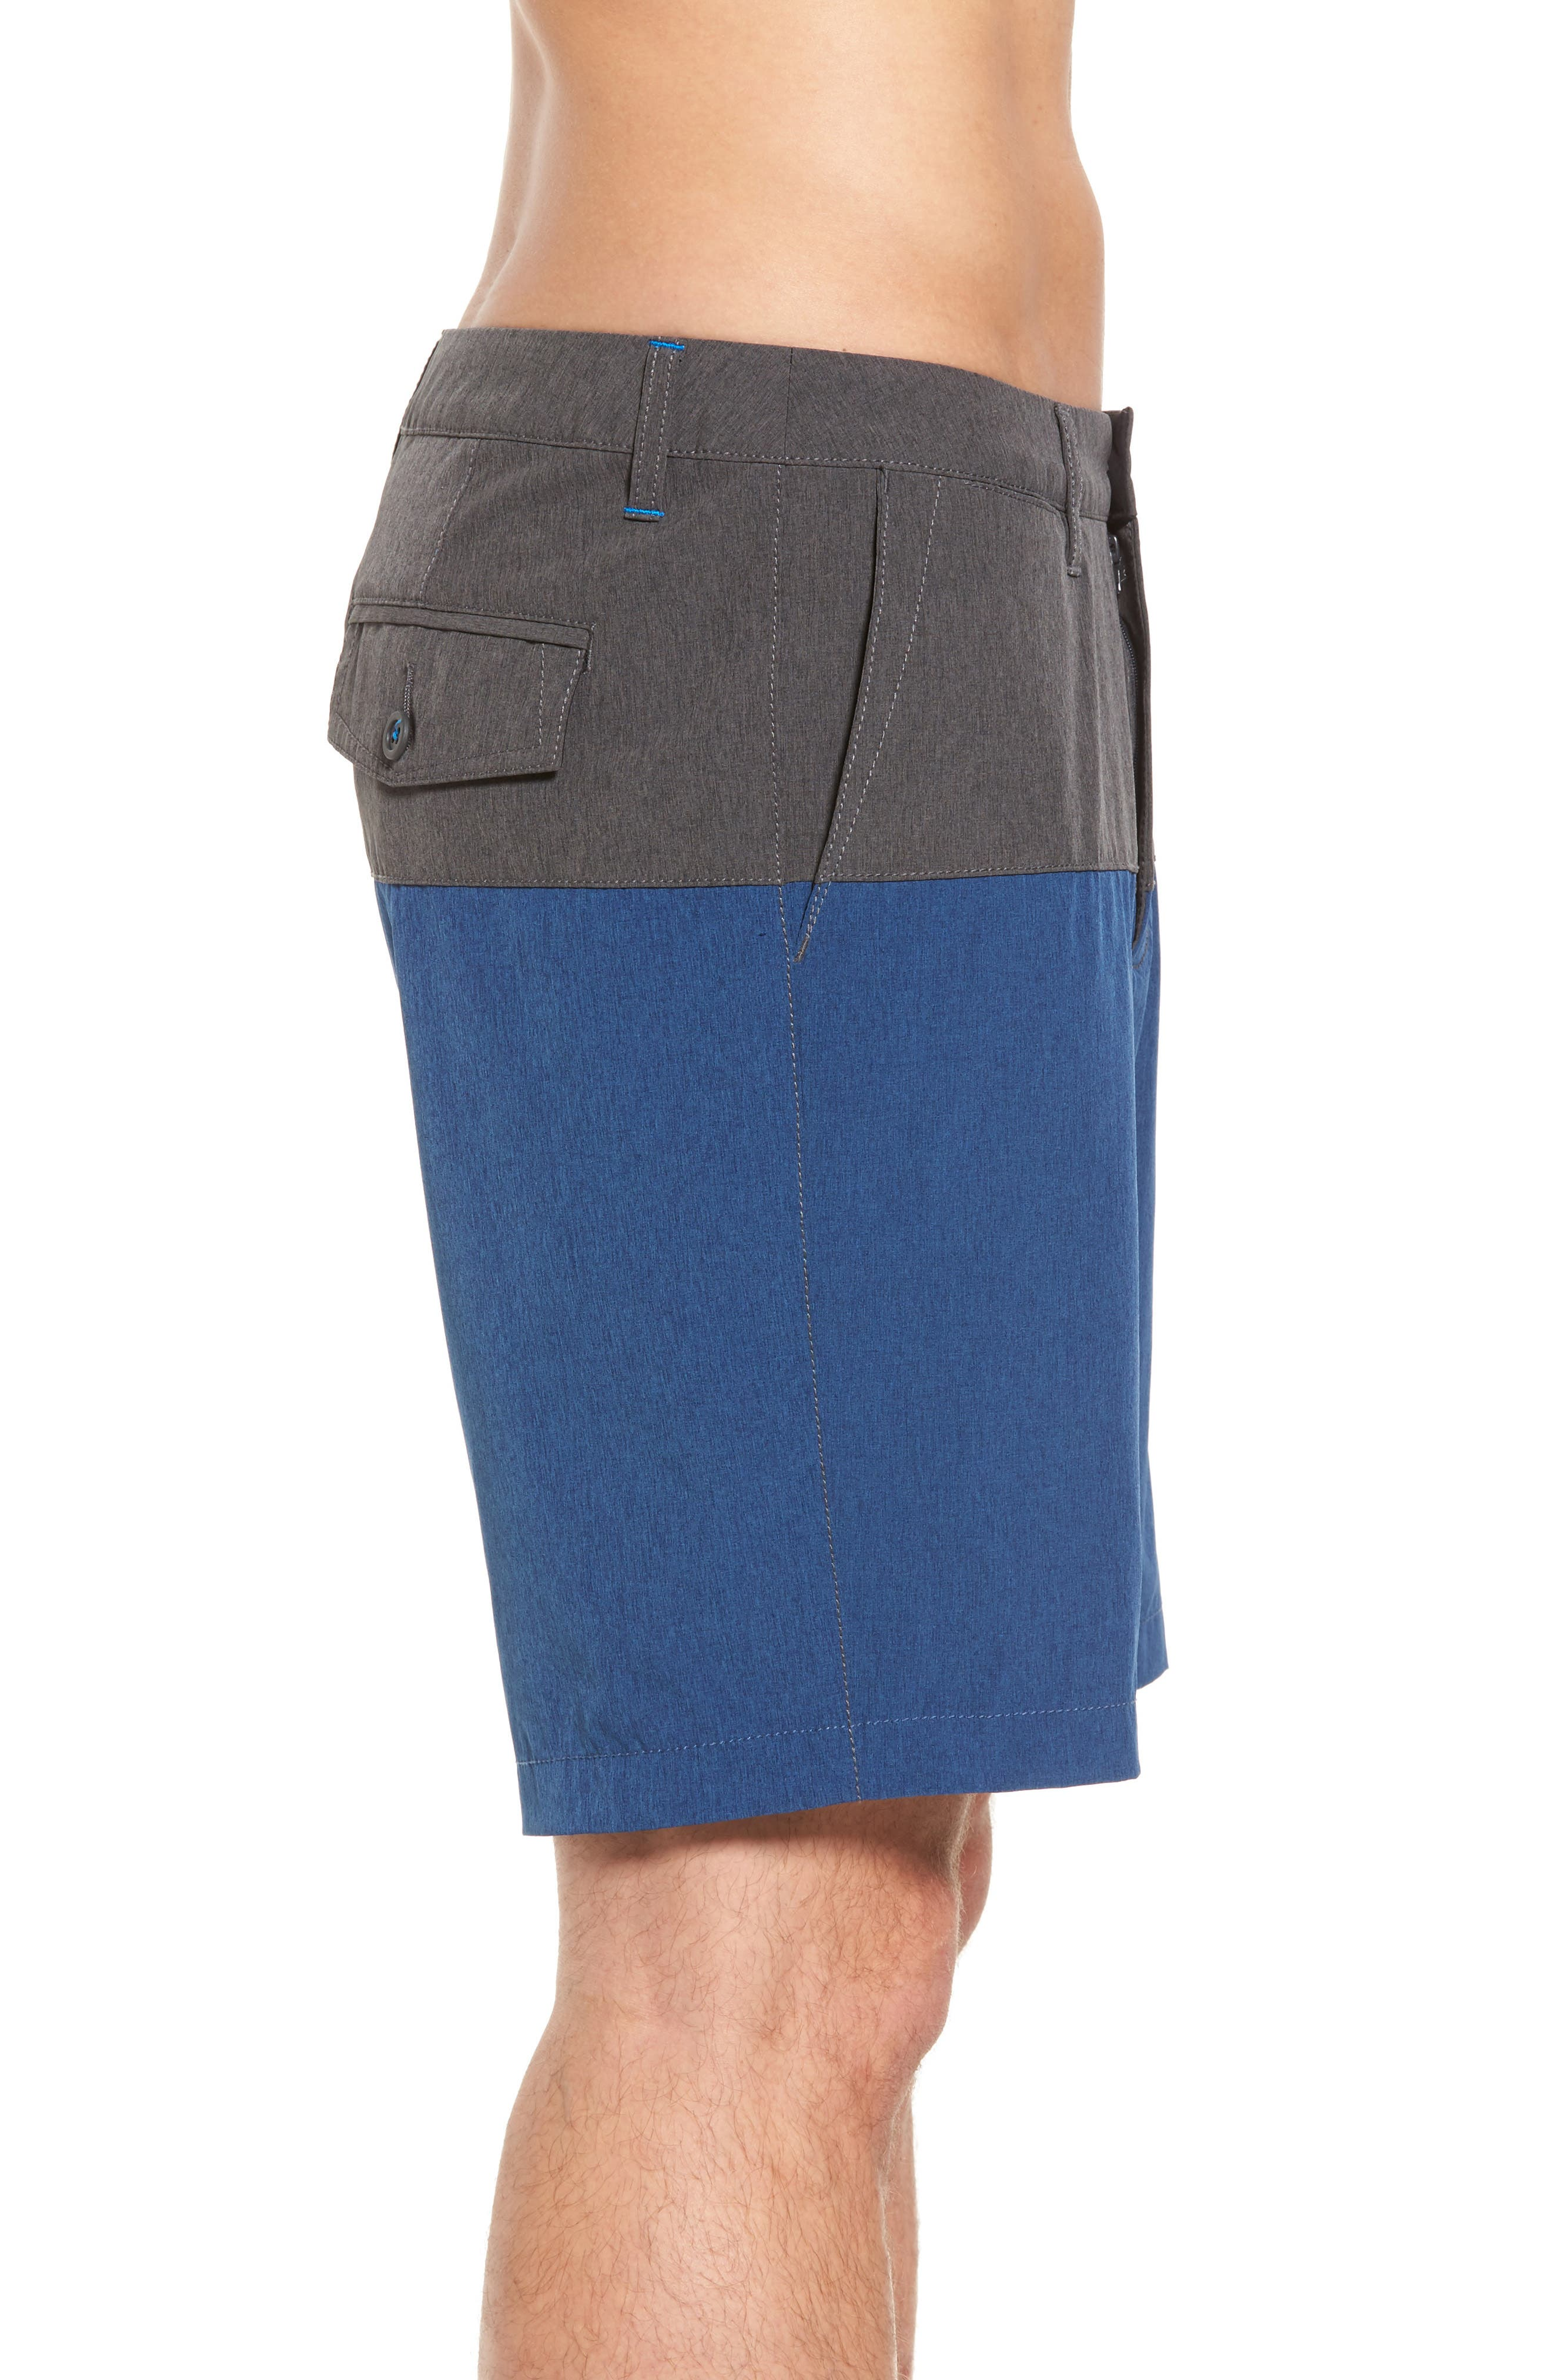 Cayman Block & Roll Hybrid Swim Shorts,                             Alternate thumbnail 3, color,                             Deep Marine